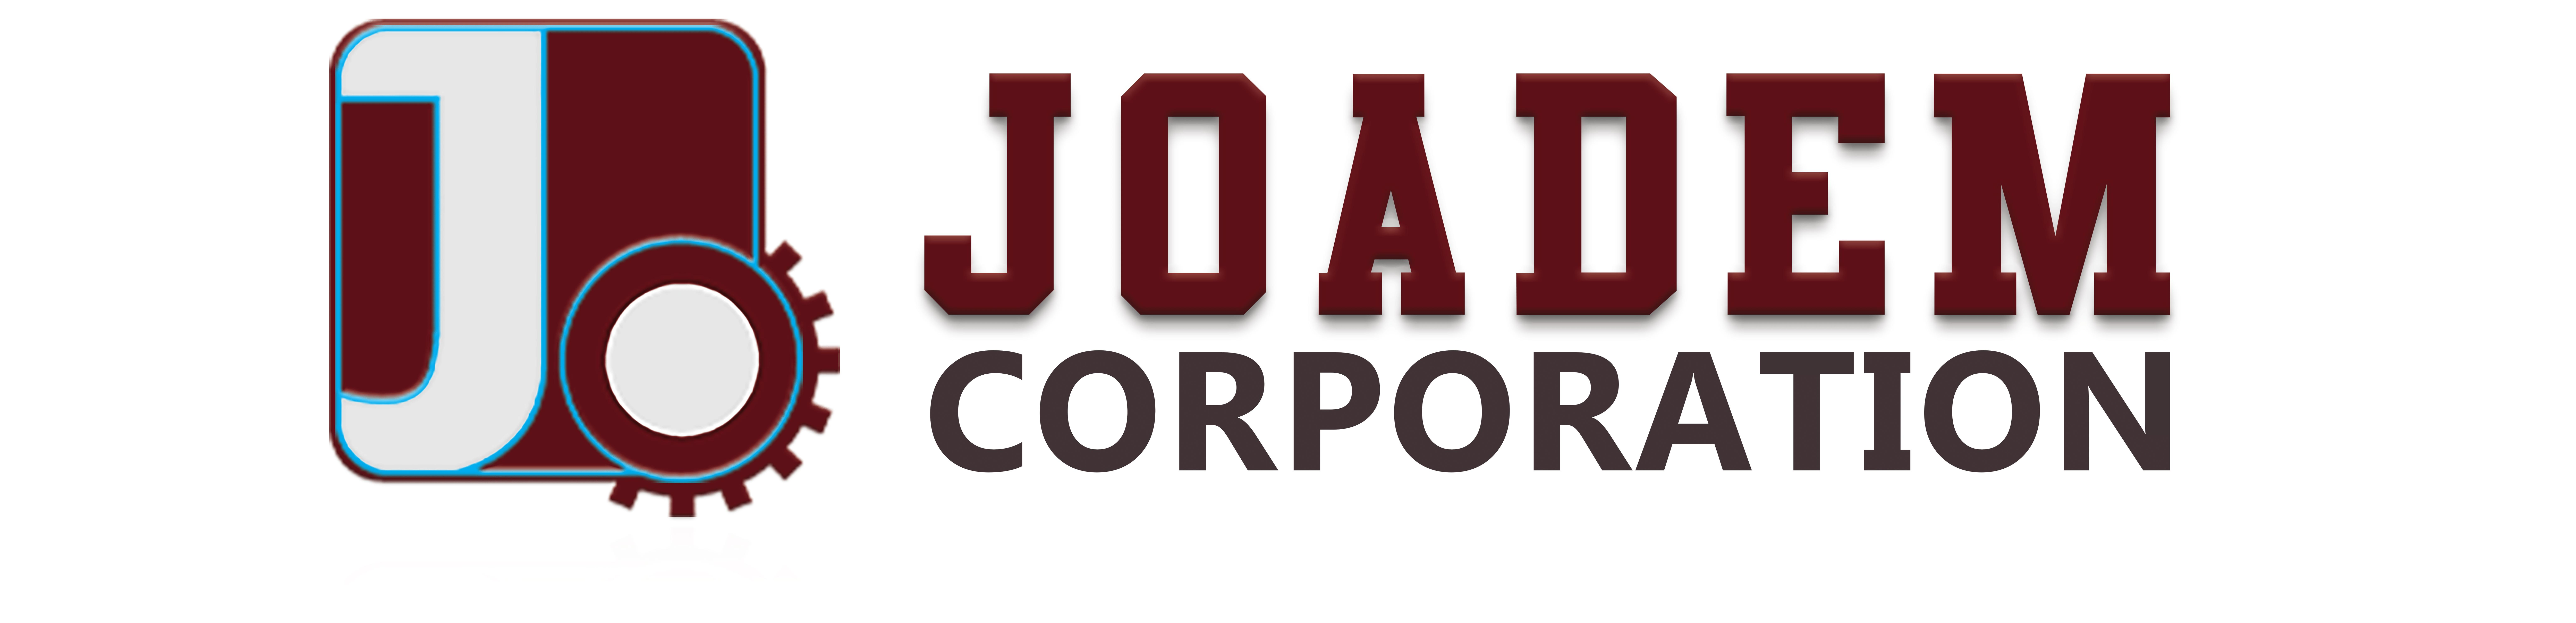 https://secureservercdn.net/166.62.108.196/h39.752.myftpupload.com/wp-content/uploads/2019/03/cropped-BIG-accepted-logo-1.png